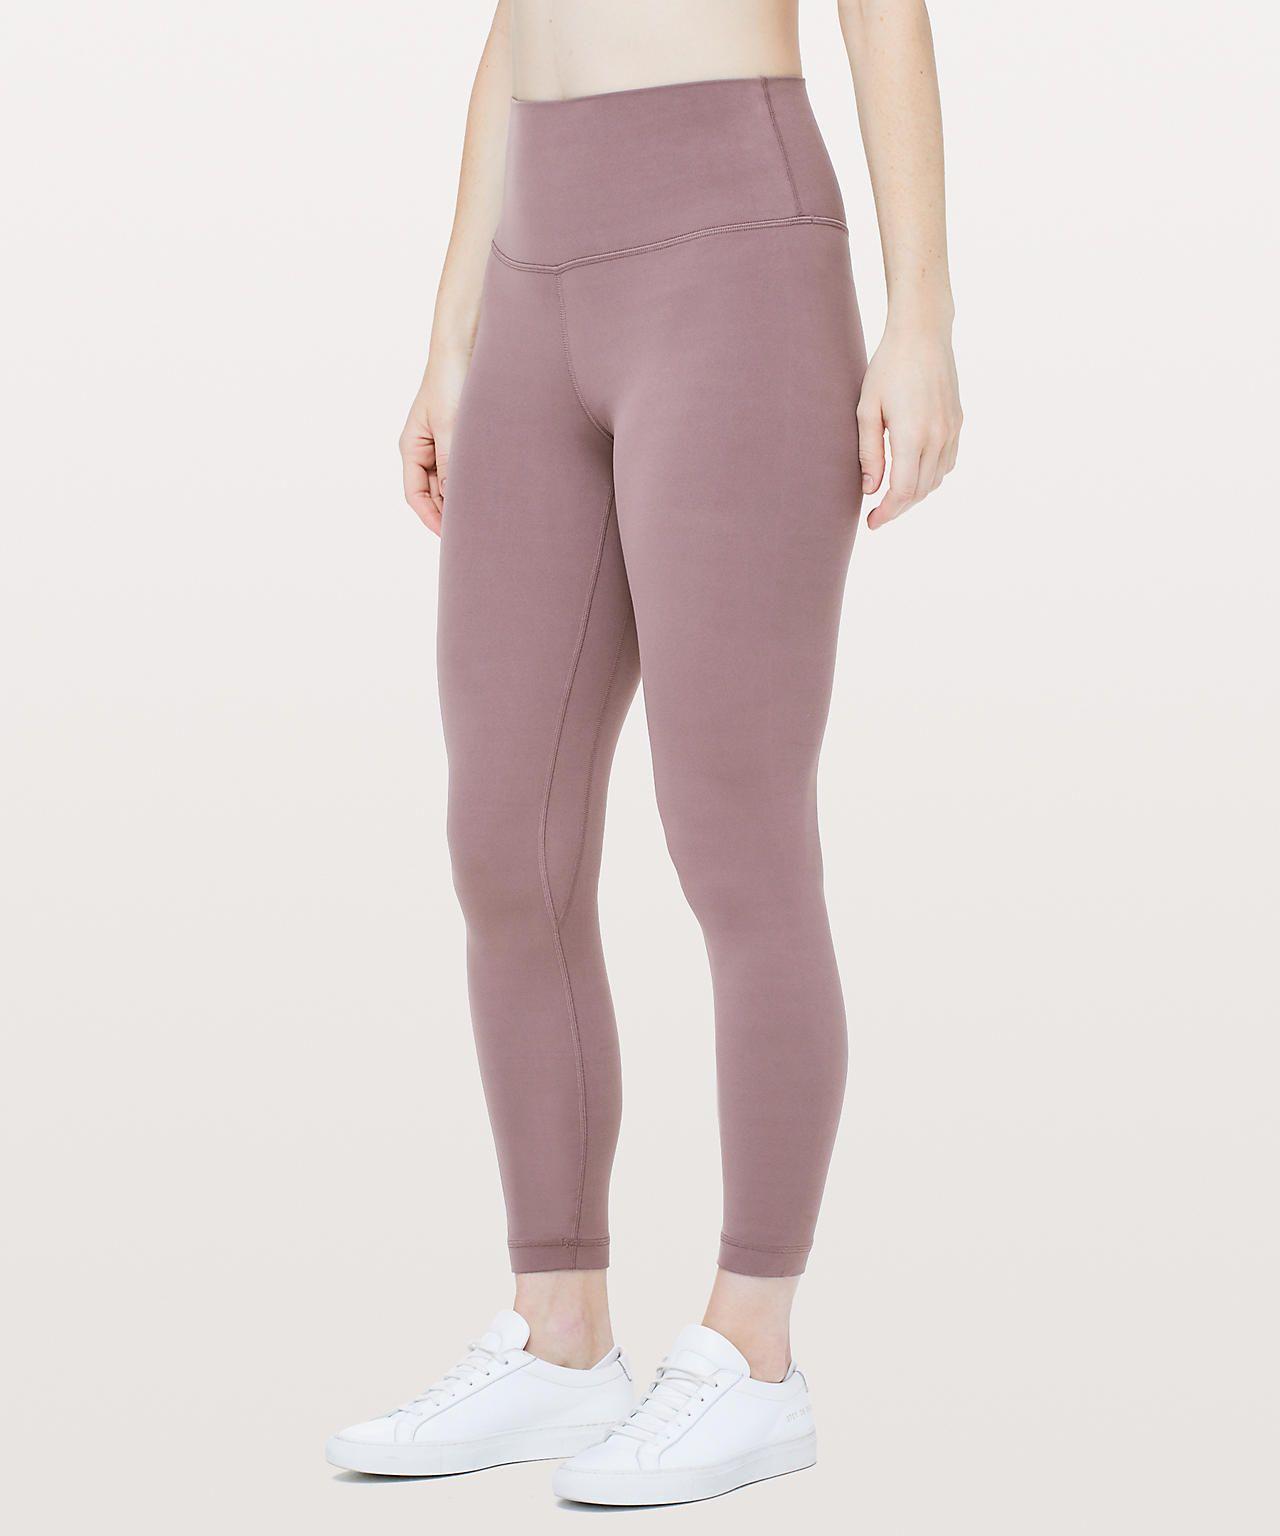 fc4eb5e36b Lululemon Align Pant II 25 in 2019 | ** 2019 Shopping list | Pants ...